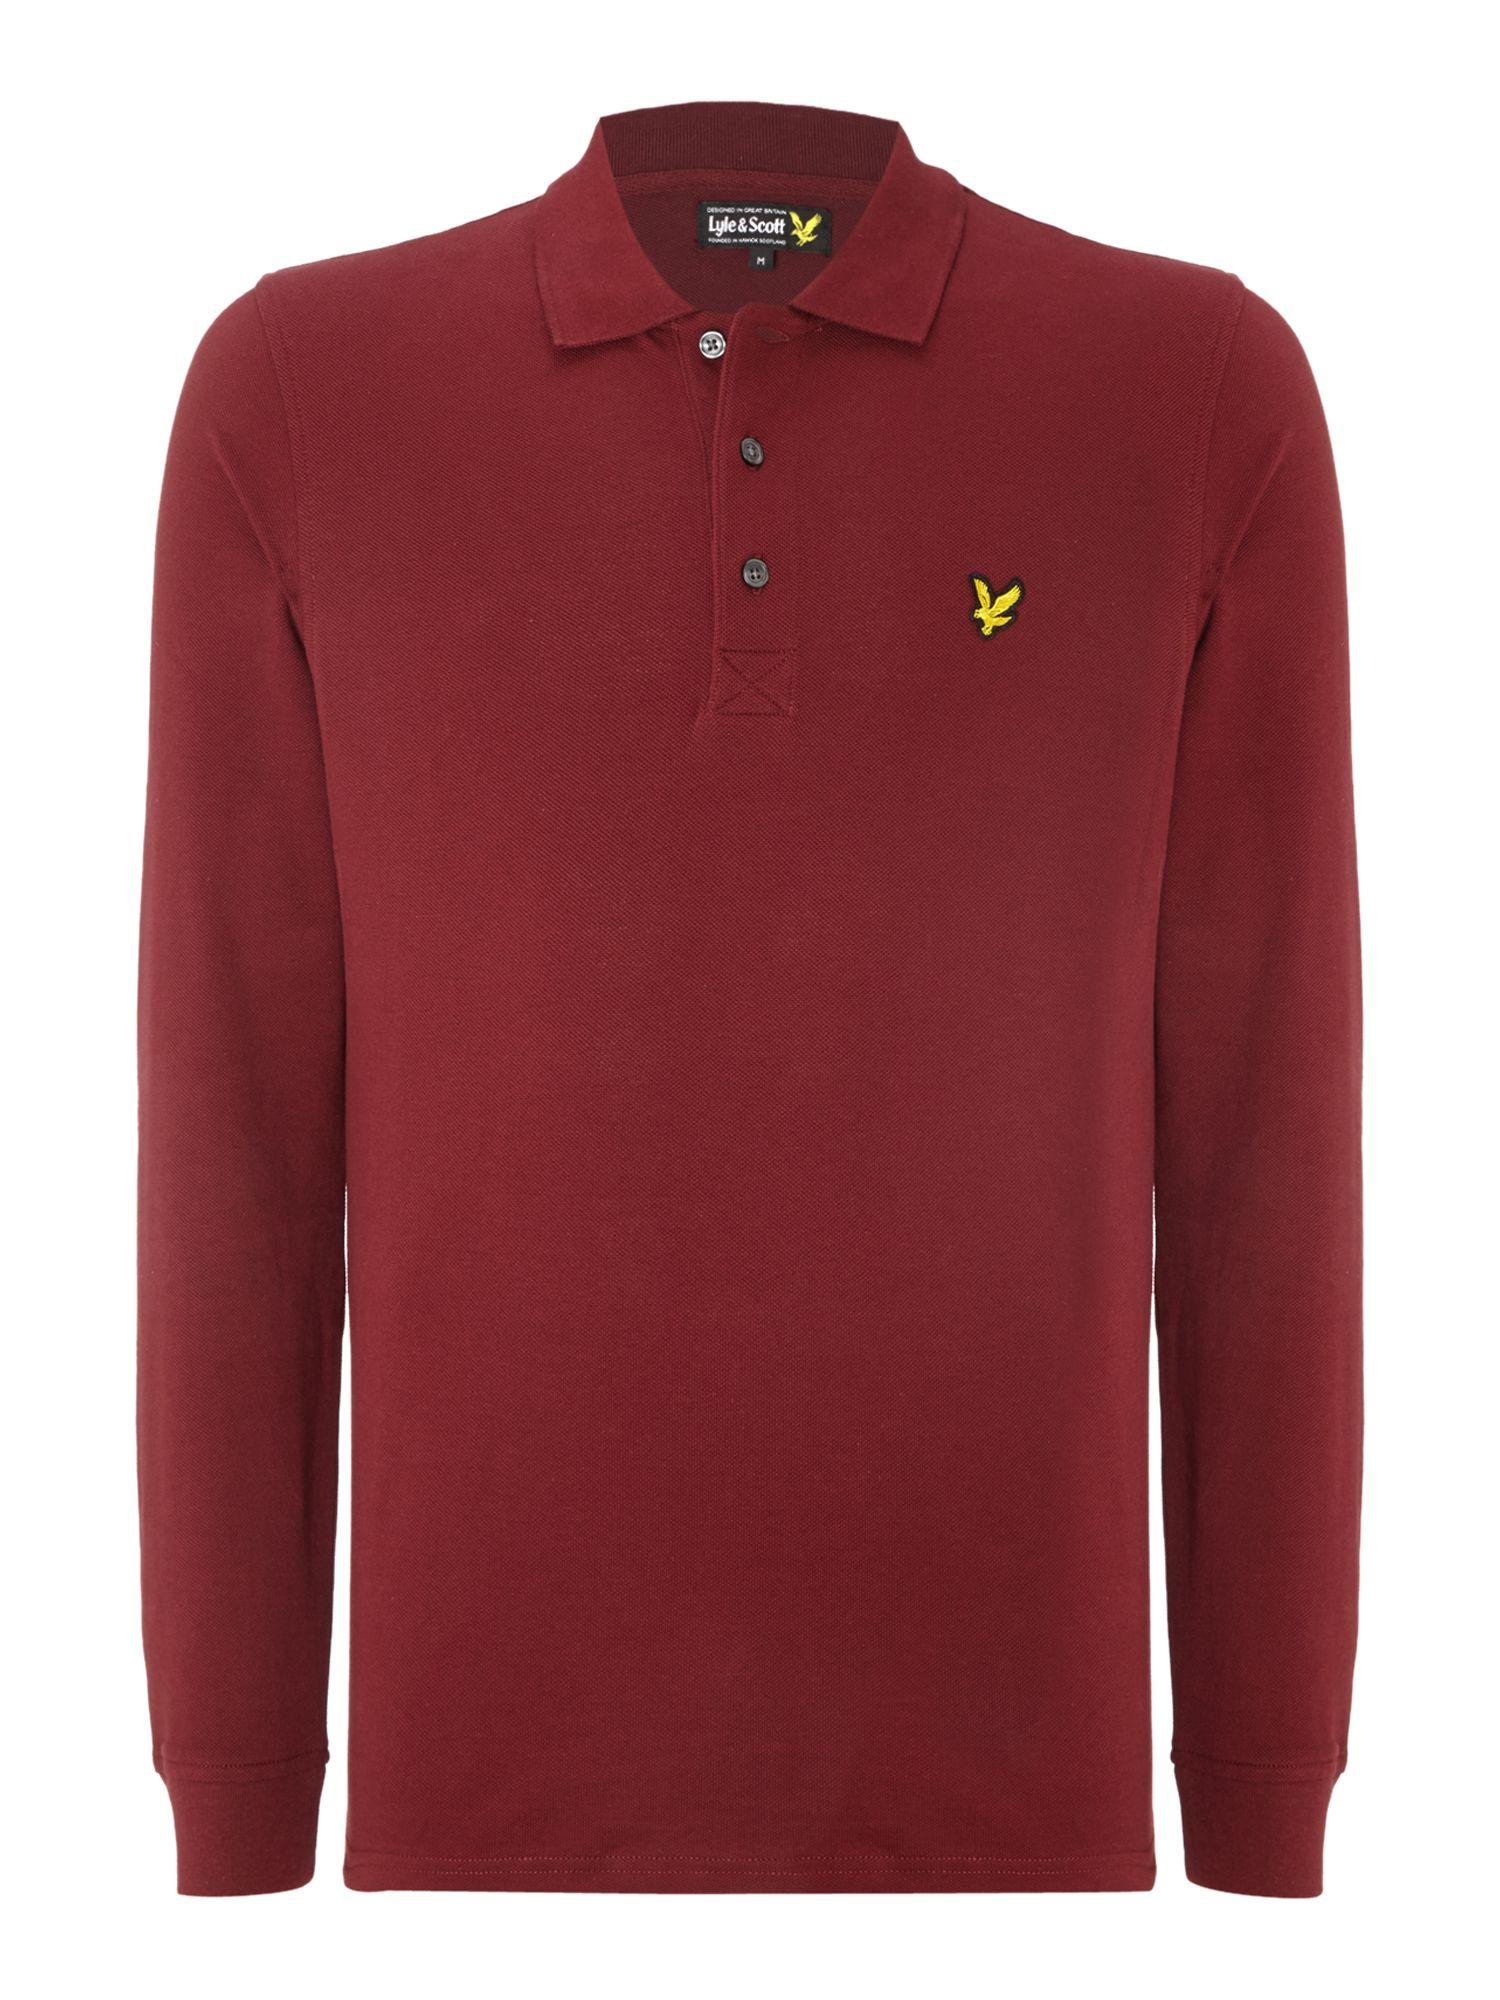 Lyle scott regular fit classic long sleeve polo shirt in for Long sleeve purple polo shirt